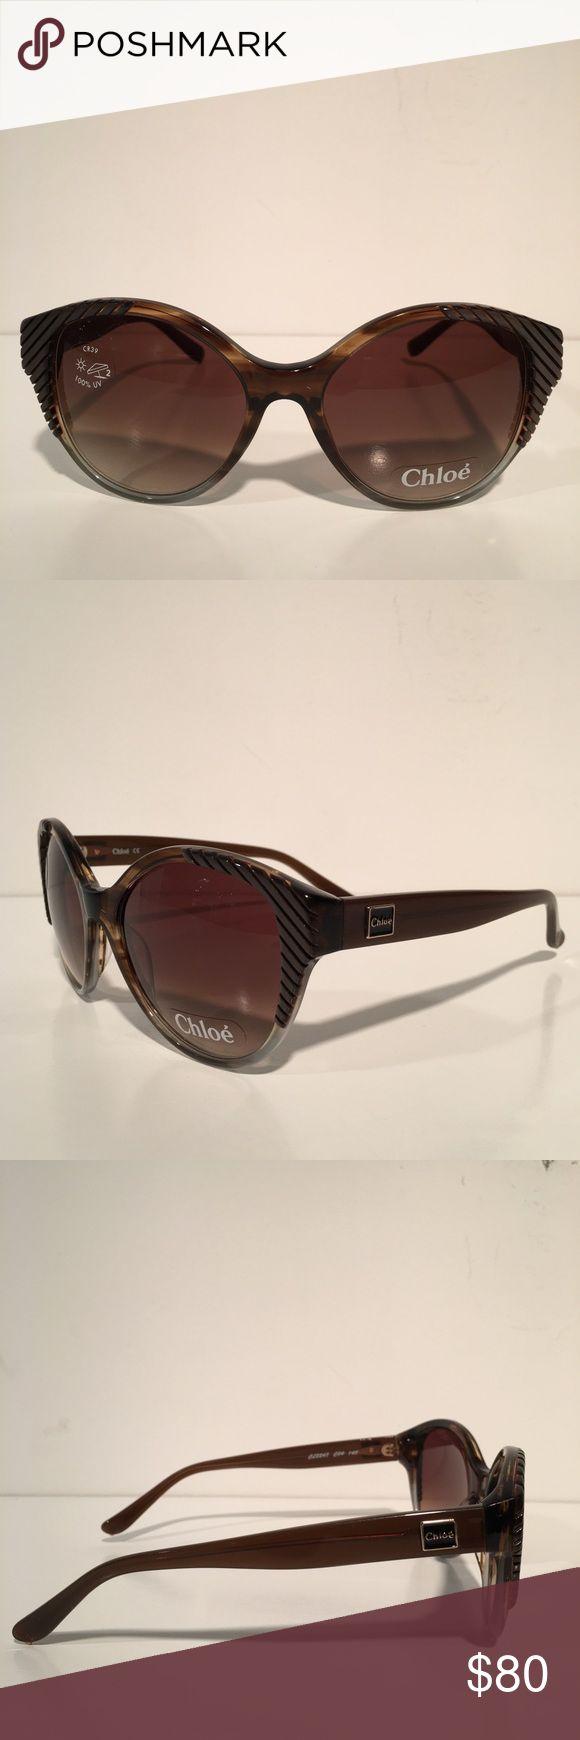 Chloe Brown Cateye Sunglasses Brand New Chloe Accessories Sunglasses